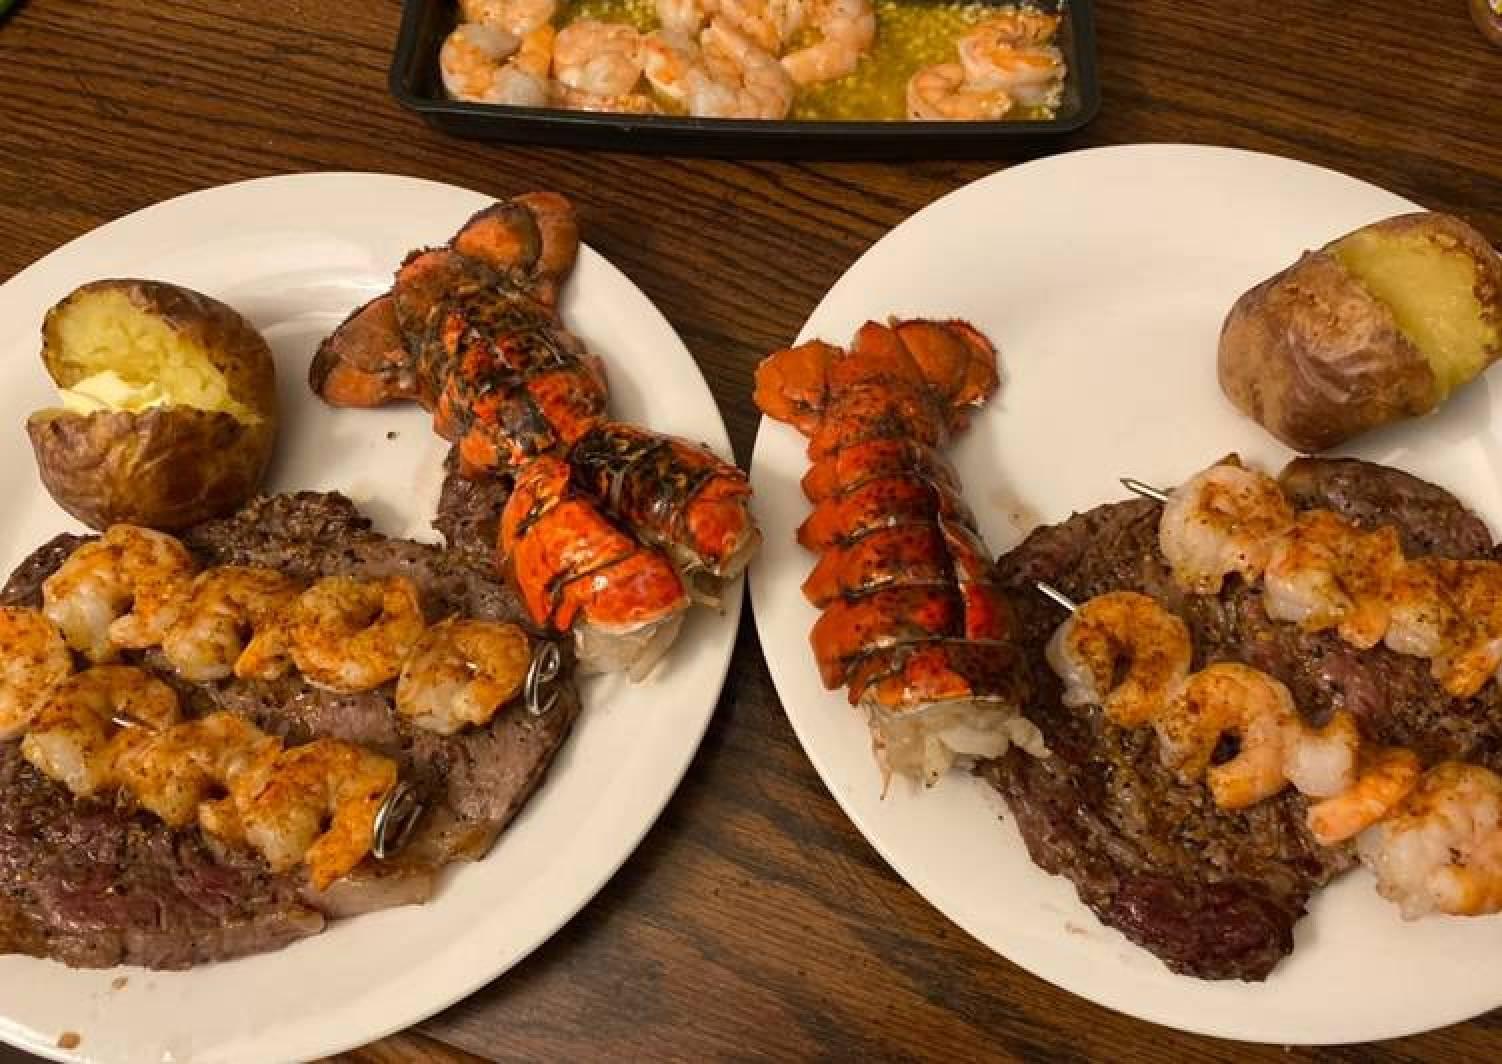 Steak, lobster, shrimp (date night series)